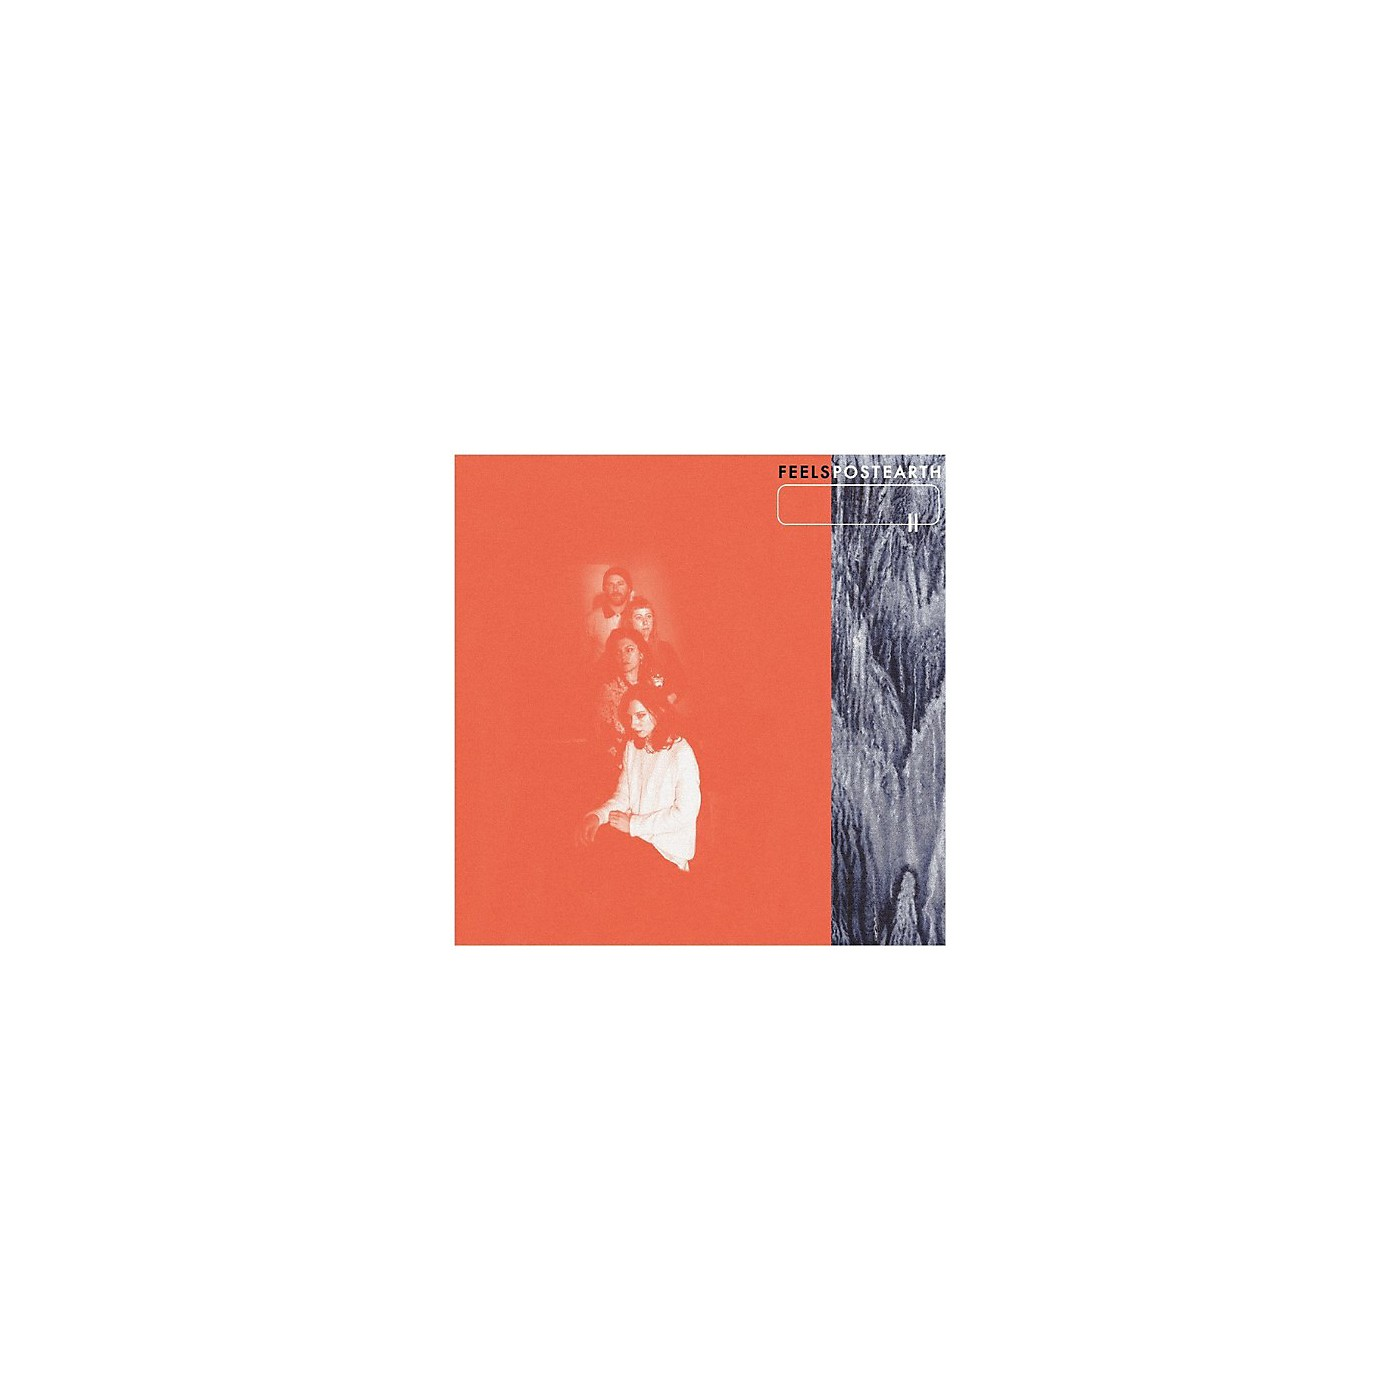 Alliance Feels - Post Earth (red Vinyl) thumbnail